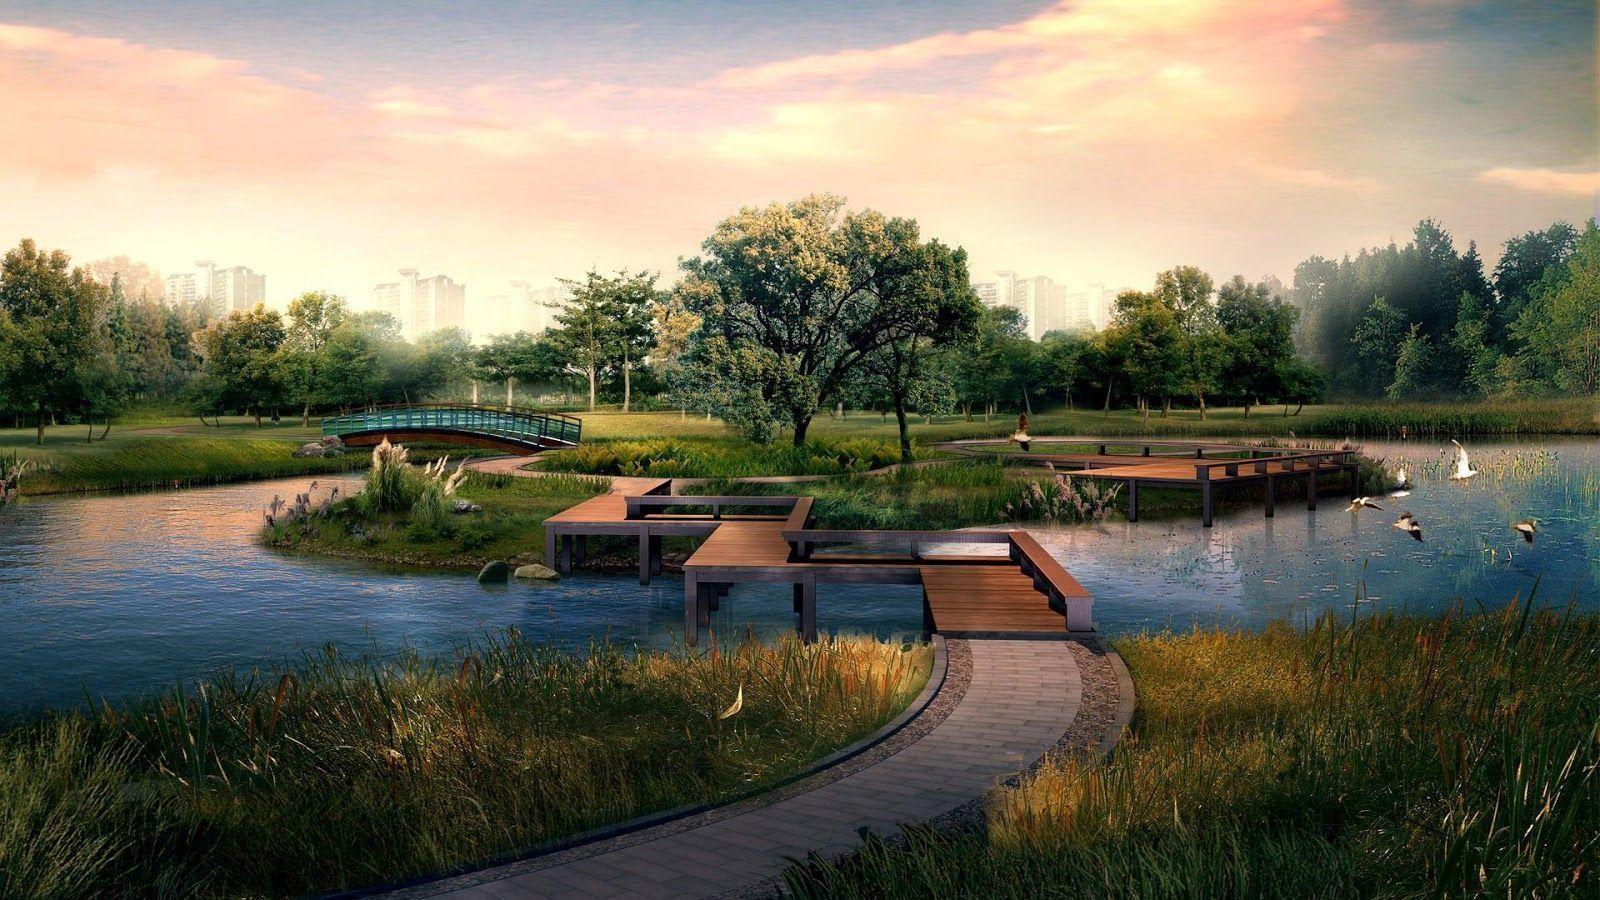 Zen Garden Live Wallpaper Android Apps On Google Play Garden Architecture Landscape Design Services Japanese Garden Landscape